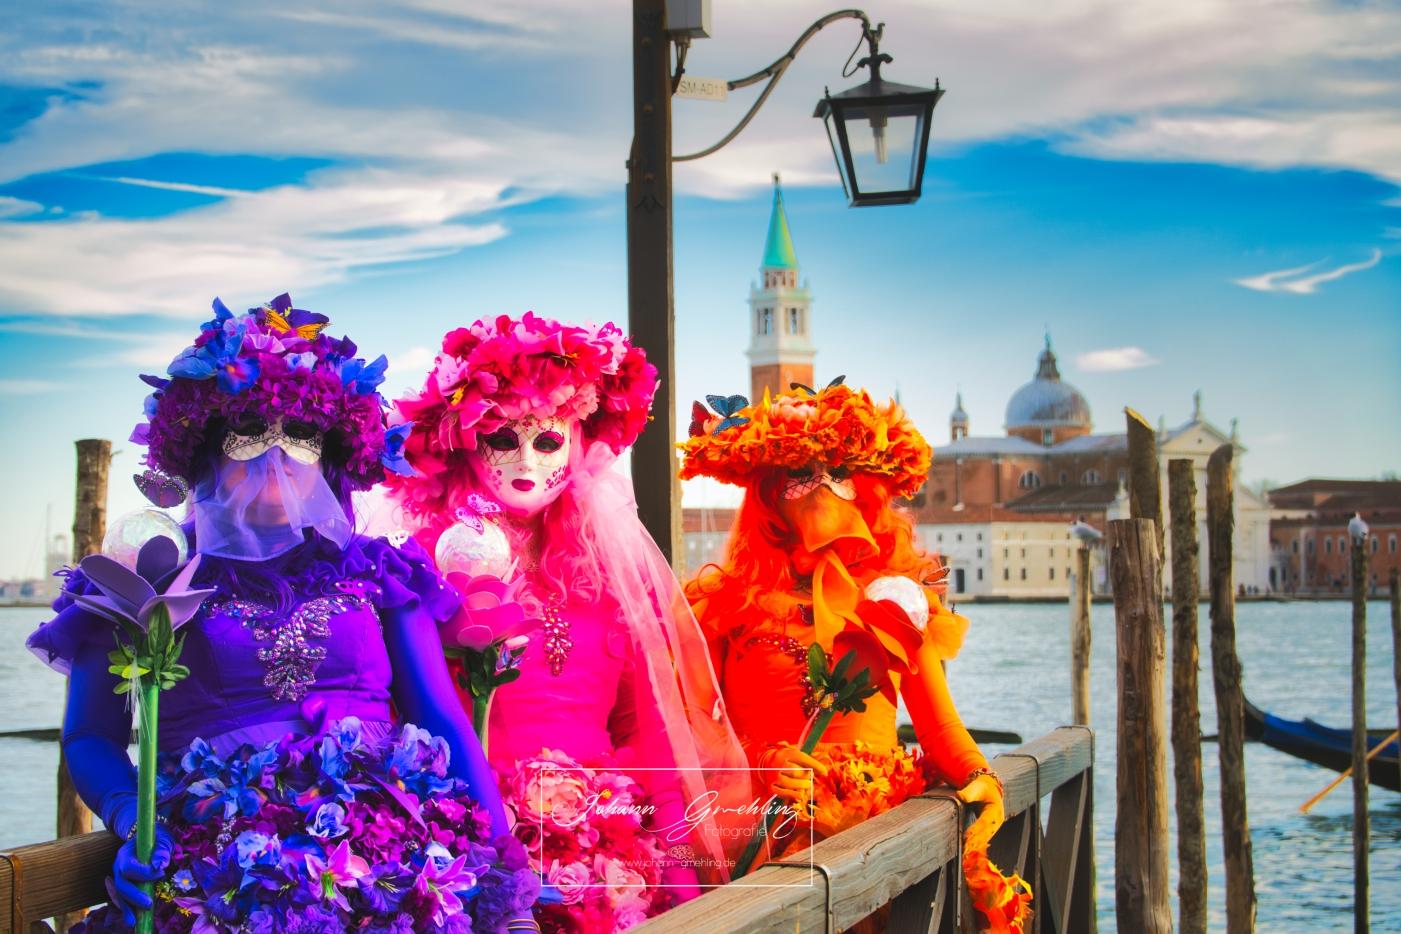 Drei Damen mit bunten Masken am Canale Grande in Venedig